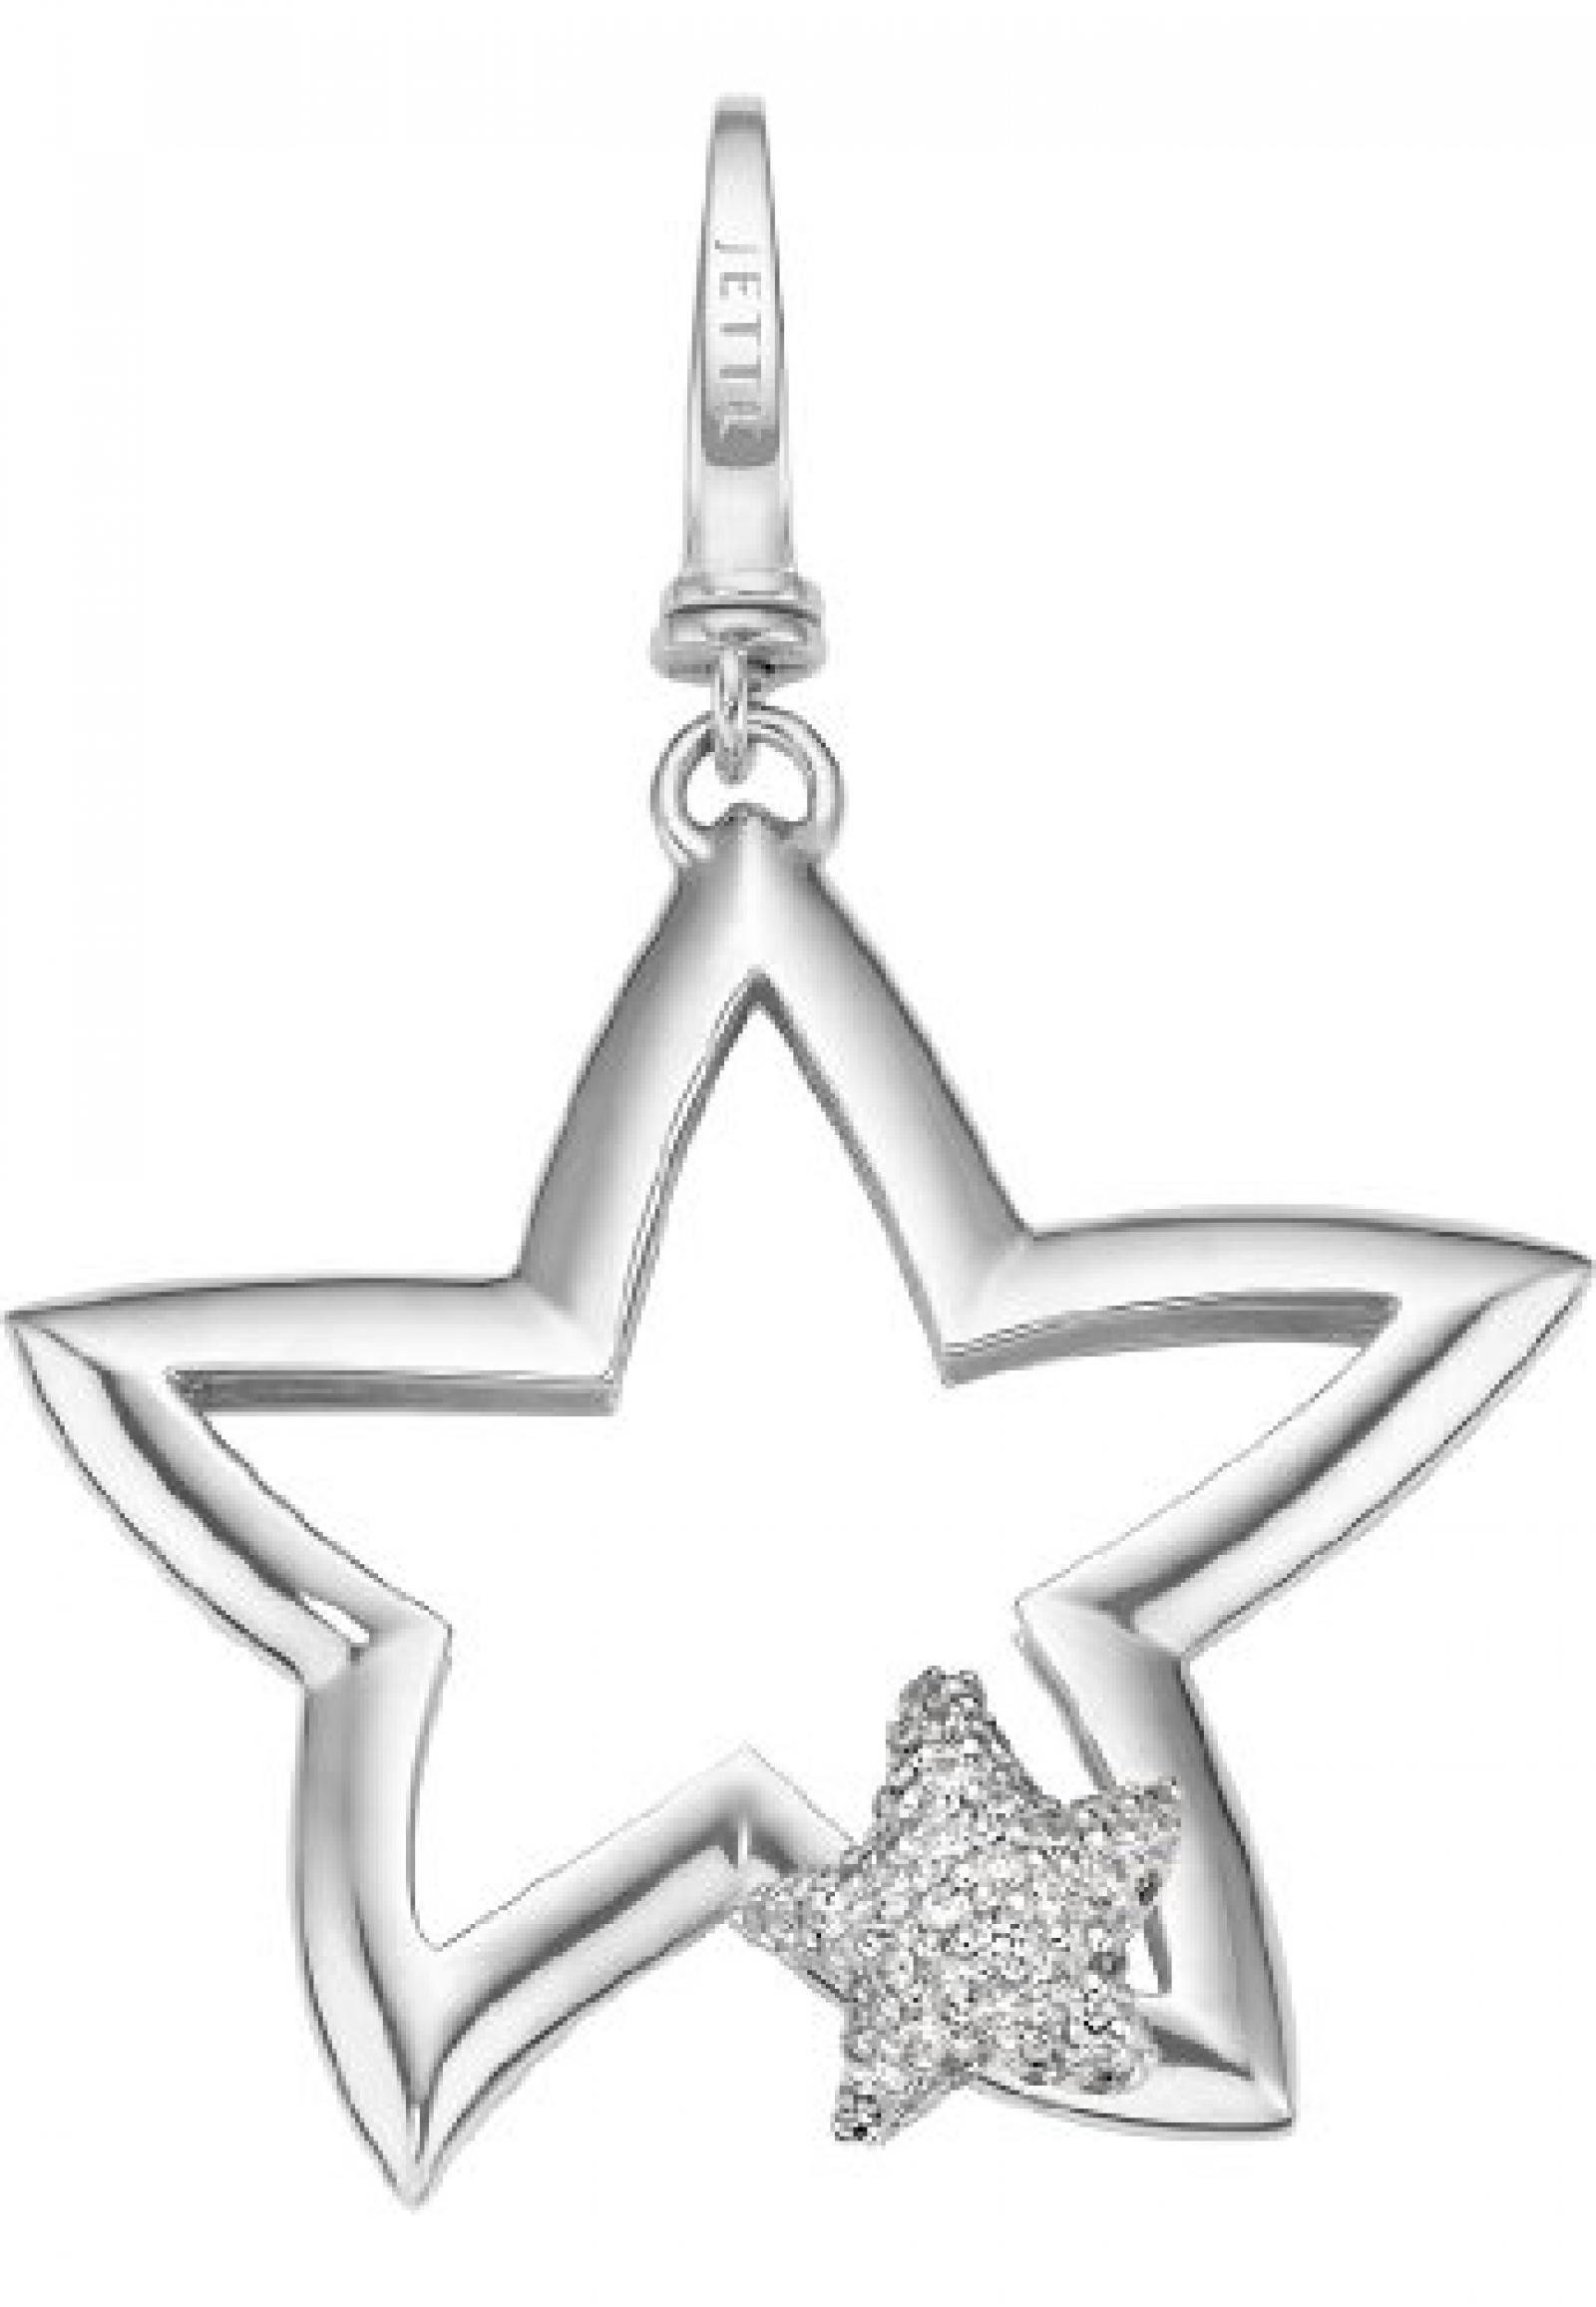 JETTE Charms Damen-Charm CHARM 925er Silber rhodiniert 38 Zirkonia One Size, silber